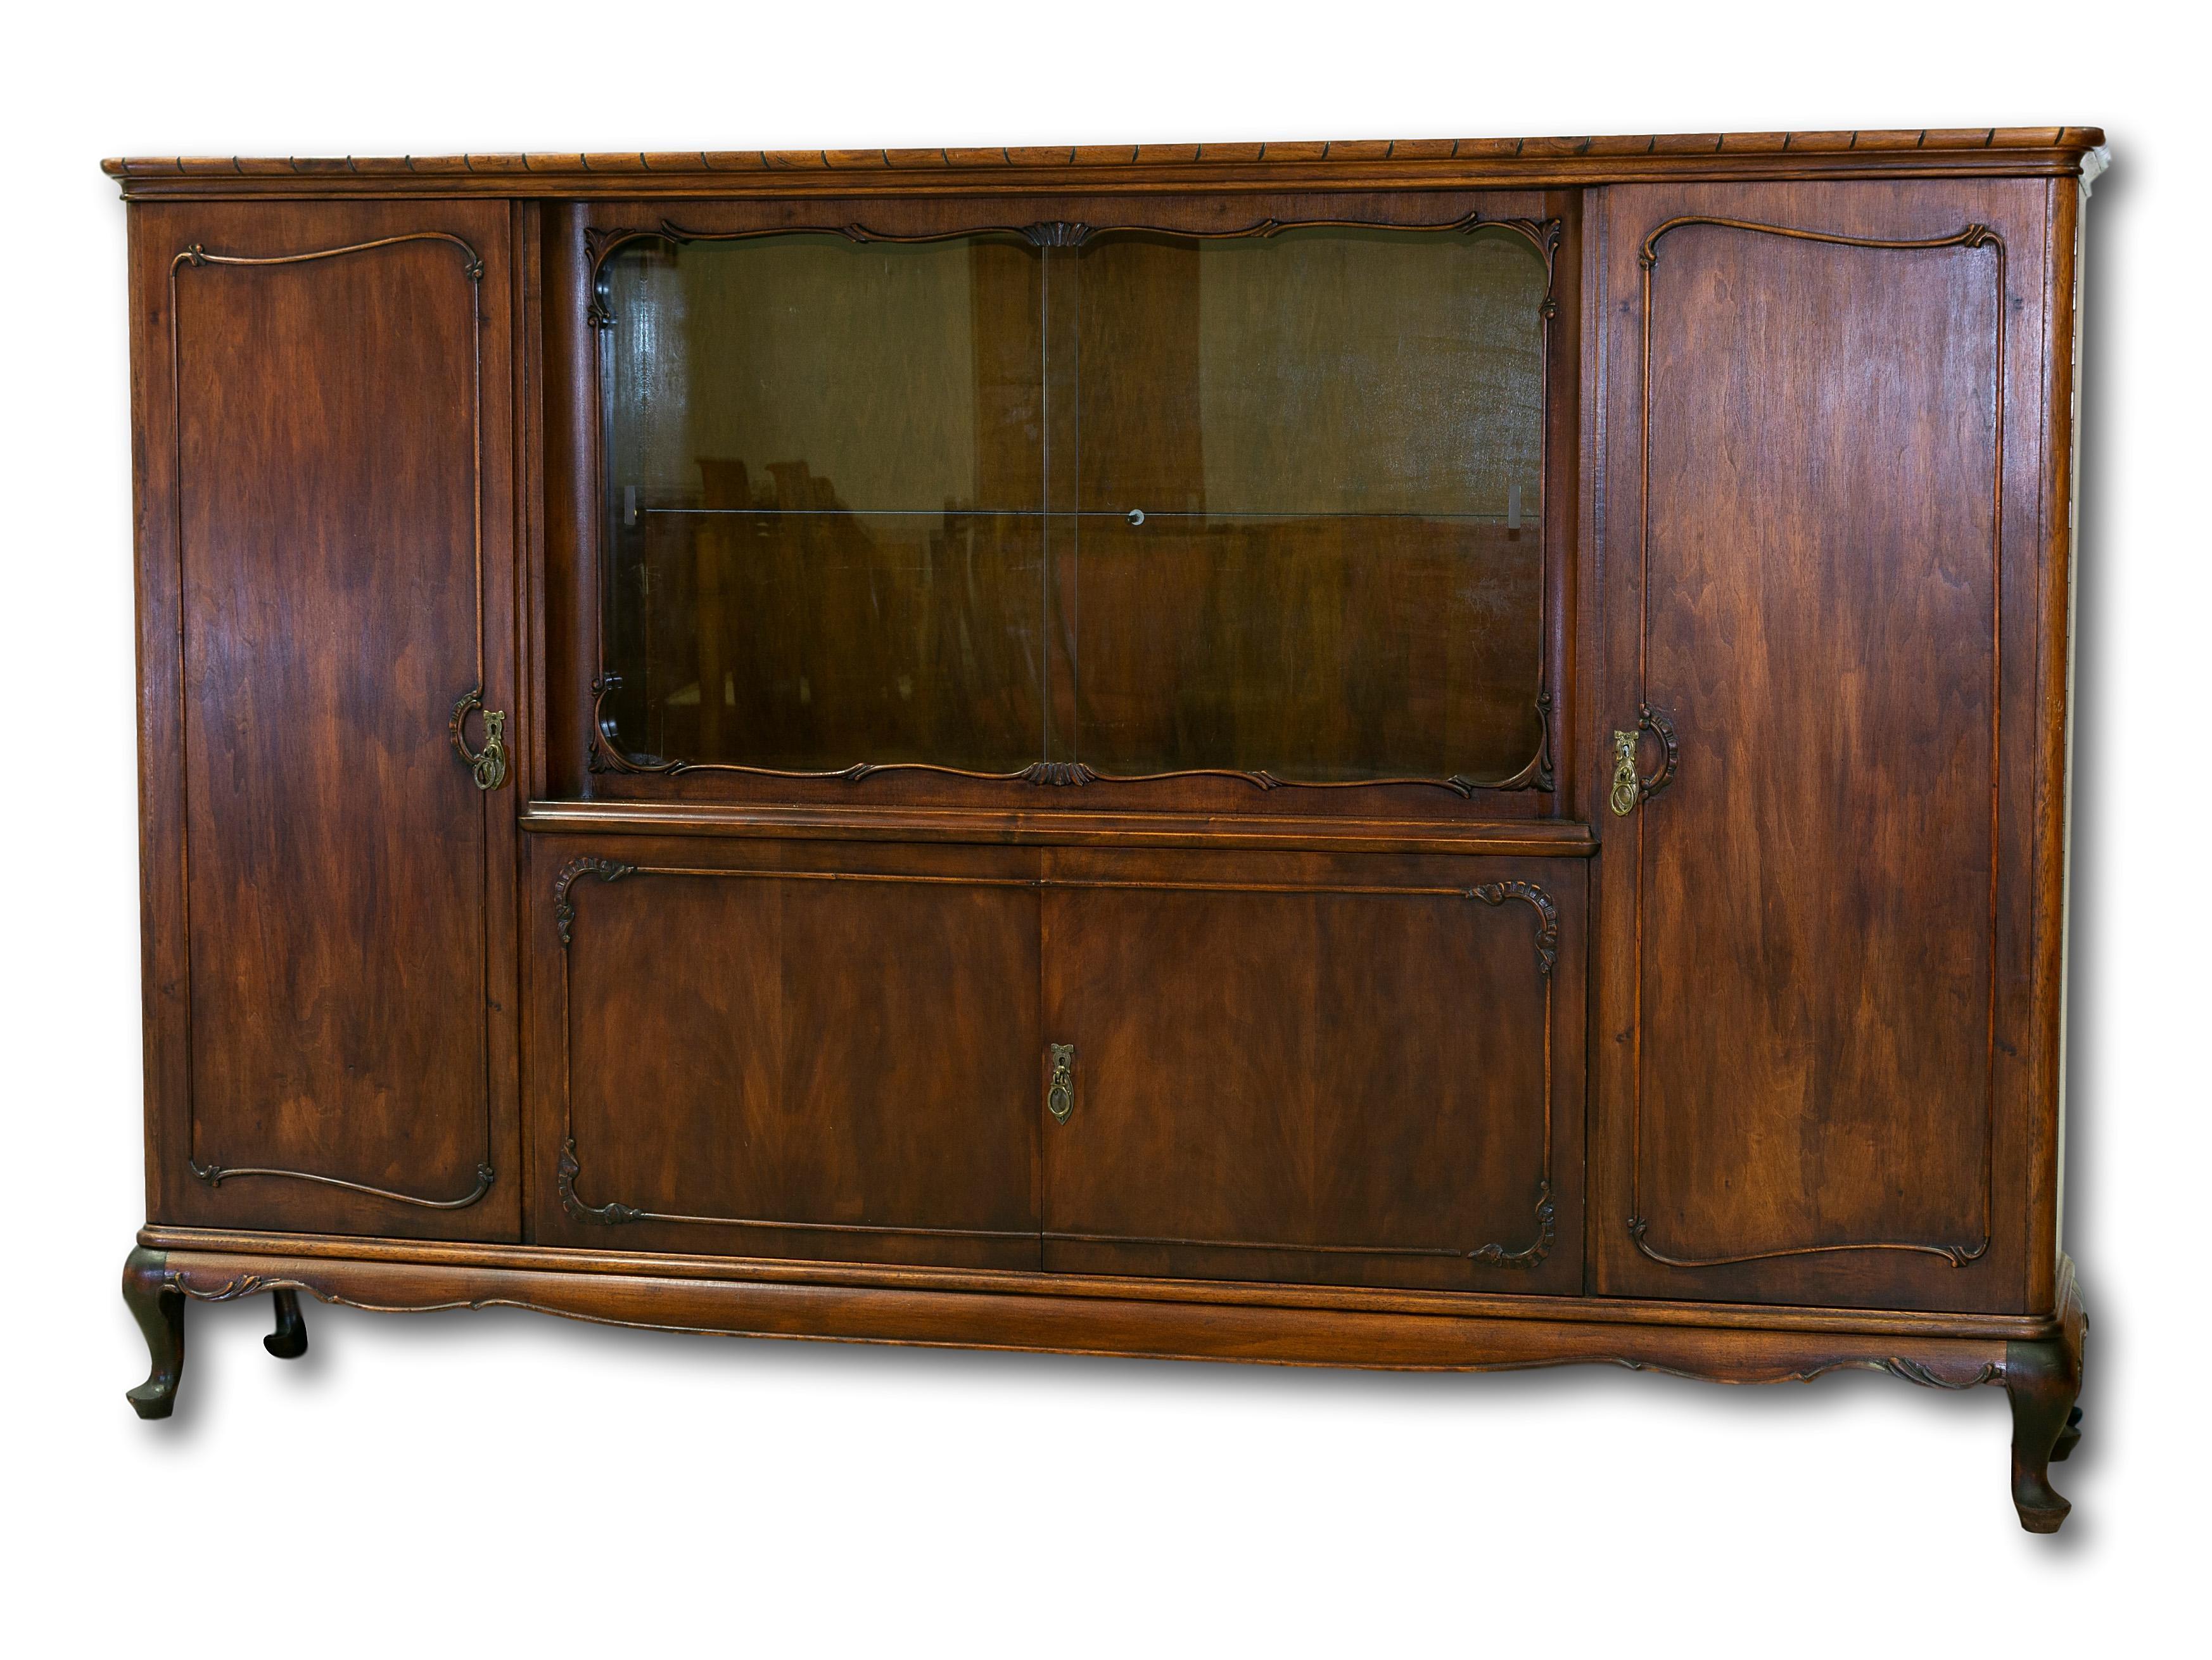 An Early 20th Century Mahogany Display Cabinet, 155 x 238 x 45